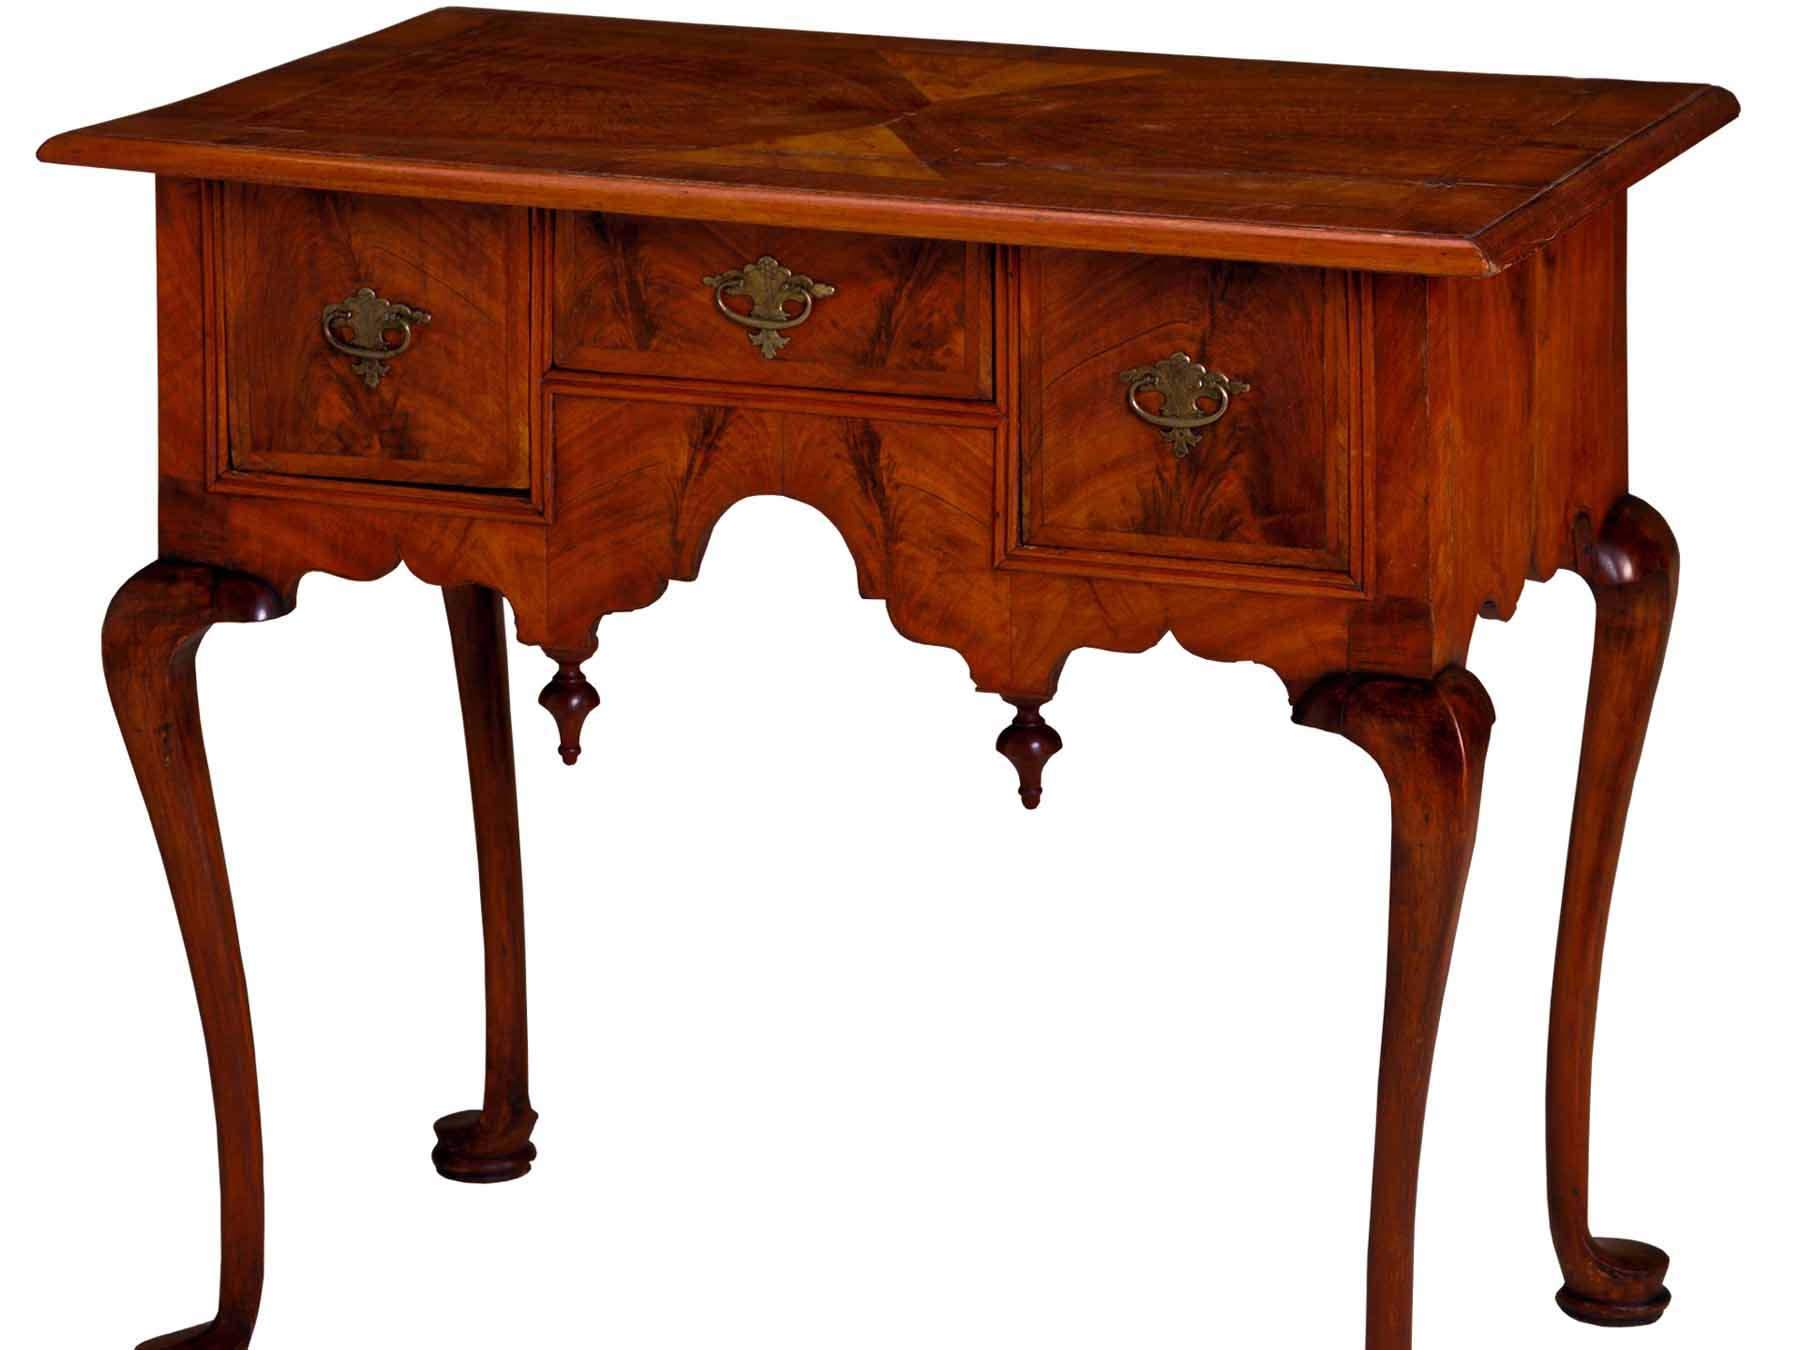 Antiques for Interiors